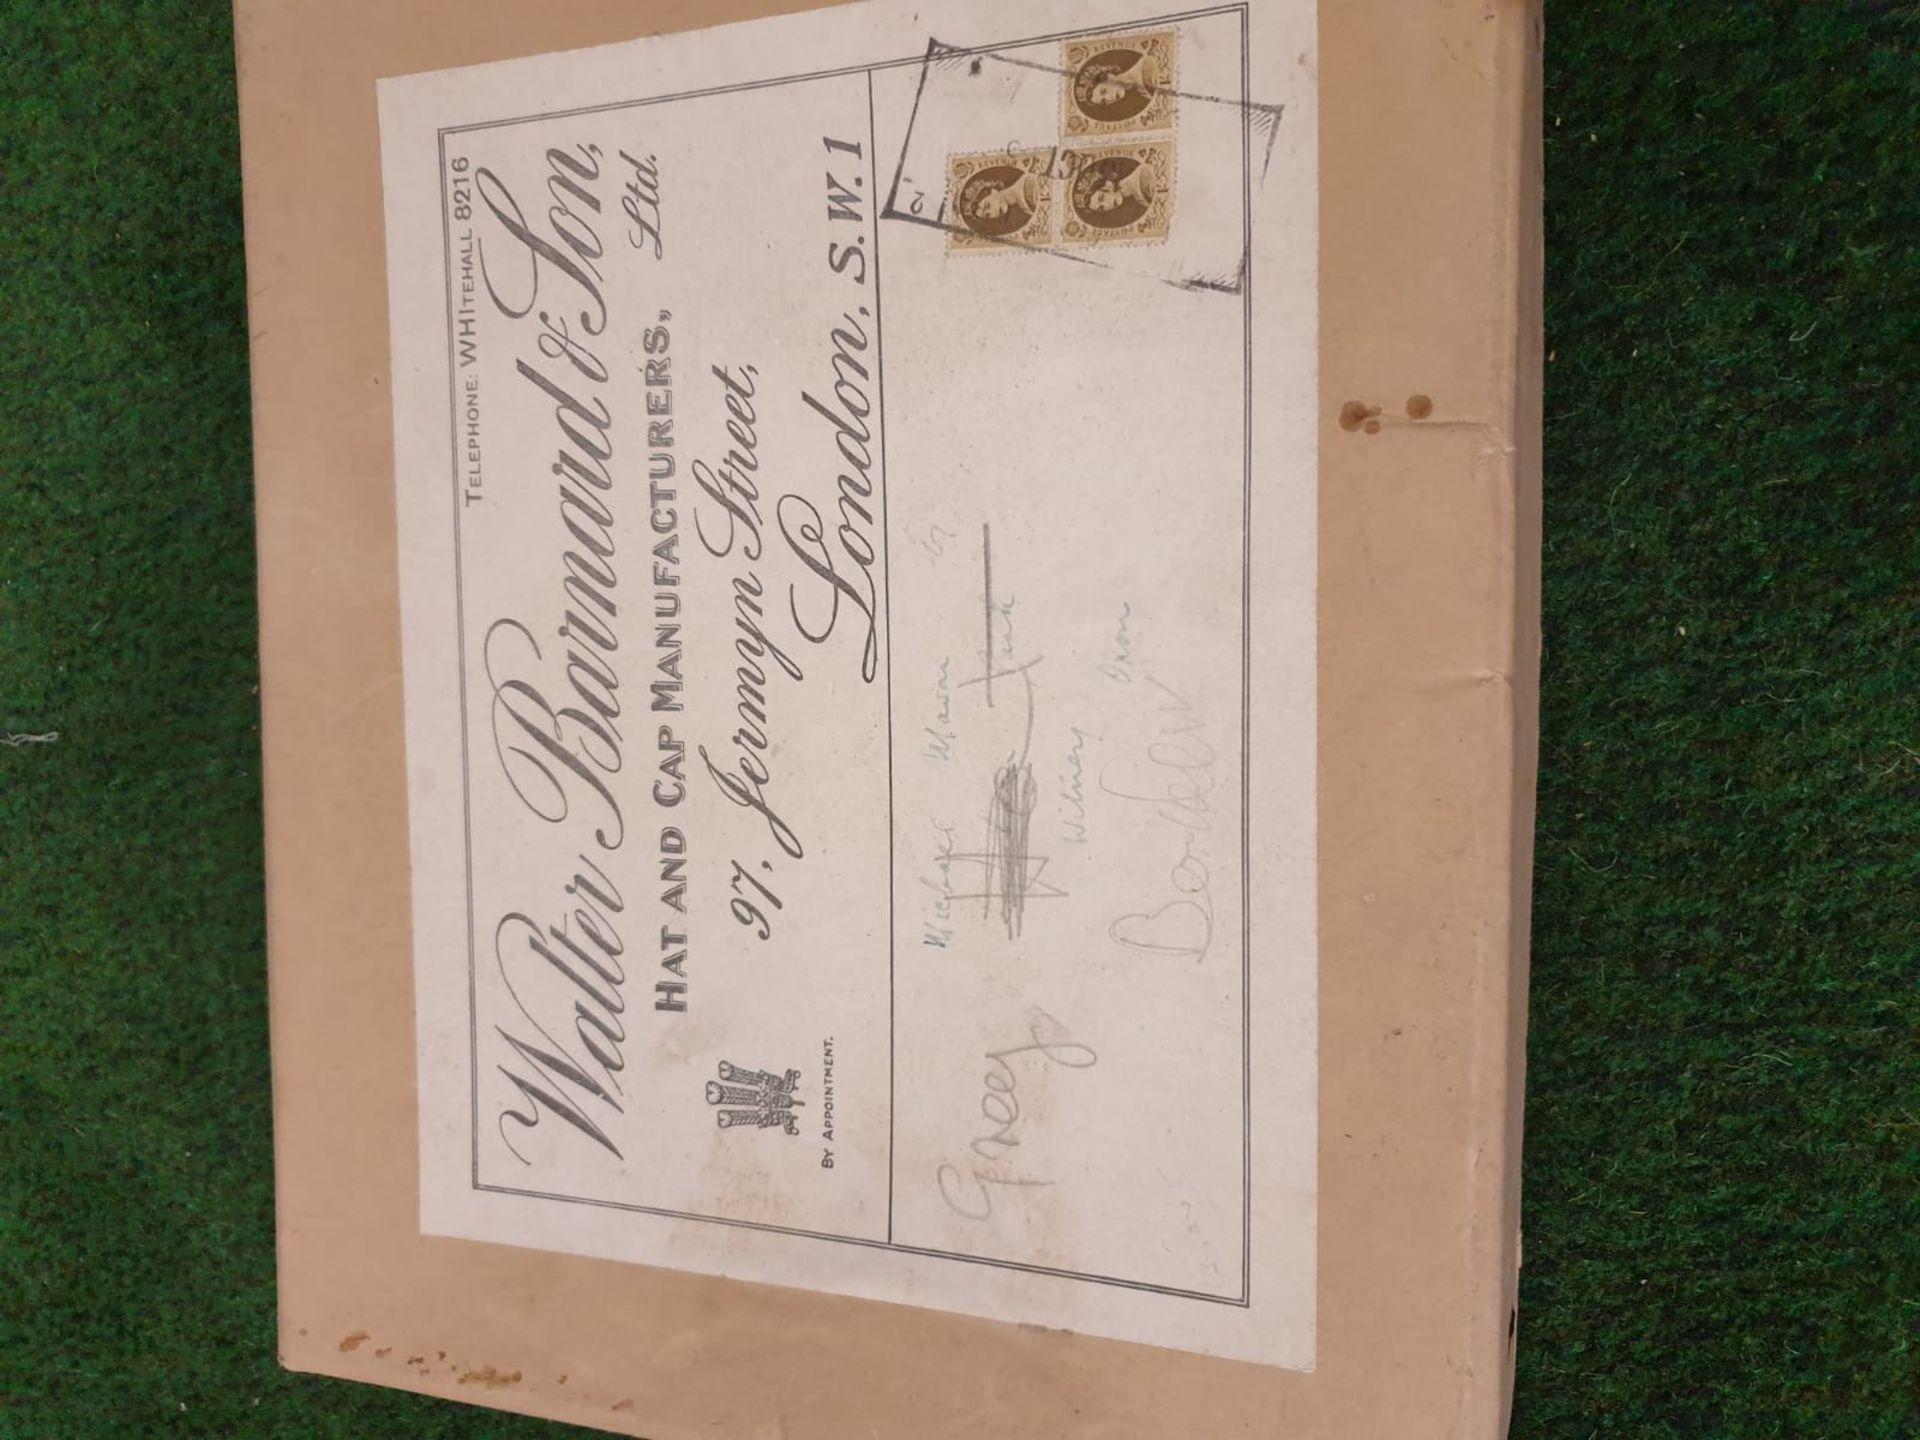 Walter Barnard & Son of Jermyn Street London Grey Bowler hat with cardboard box - Image 4 of 4